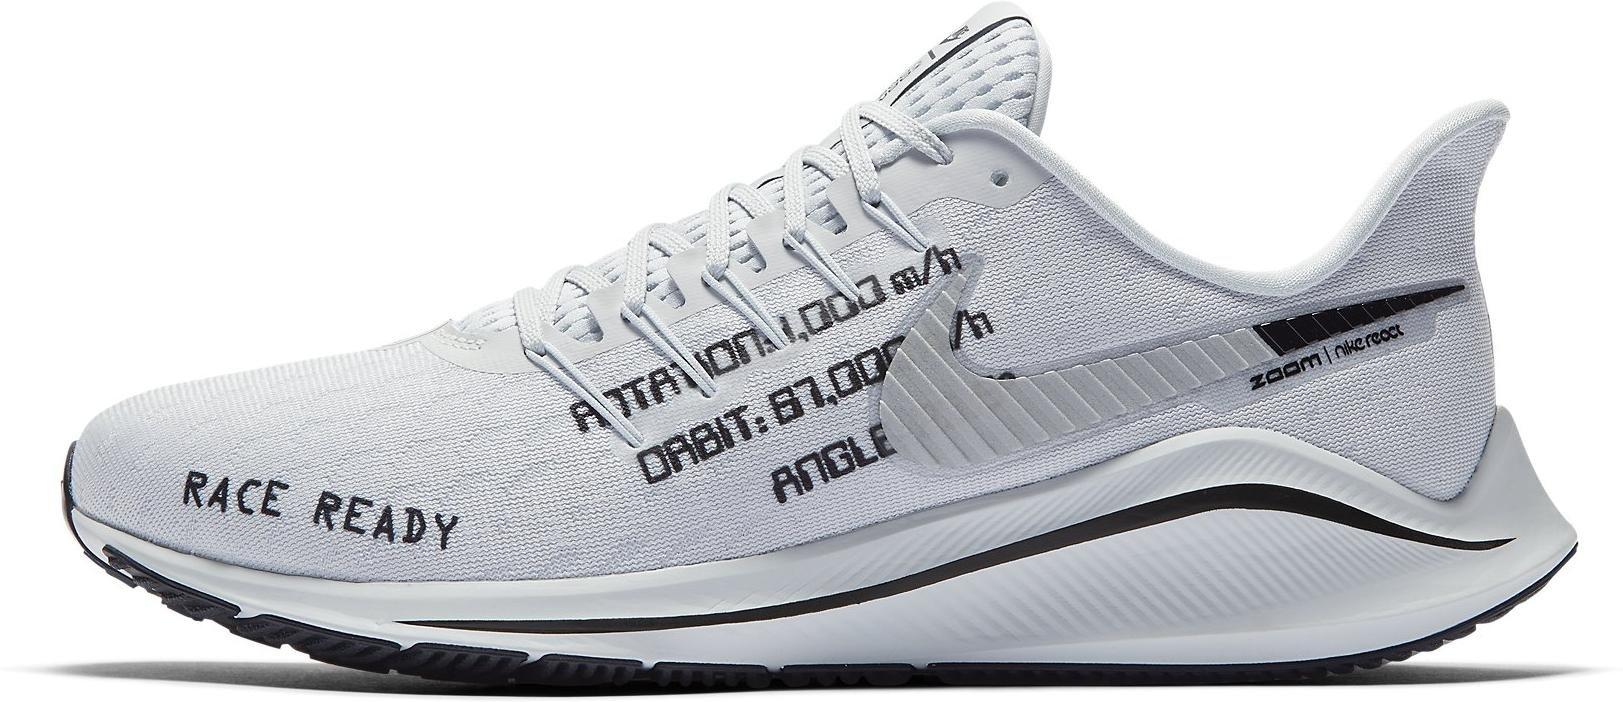 Laufschuhe Nike AIR ZOOM VOMERO 14